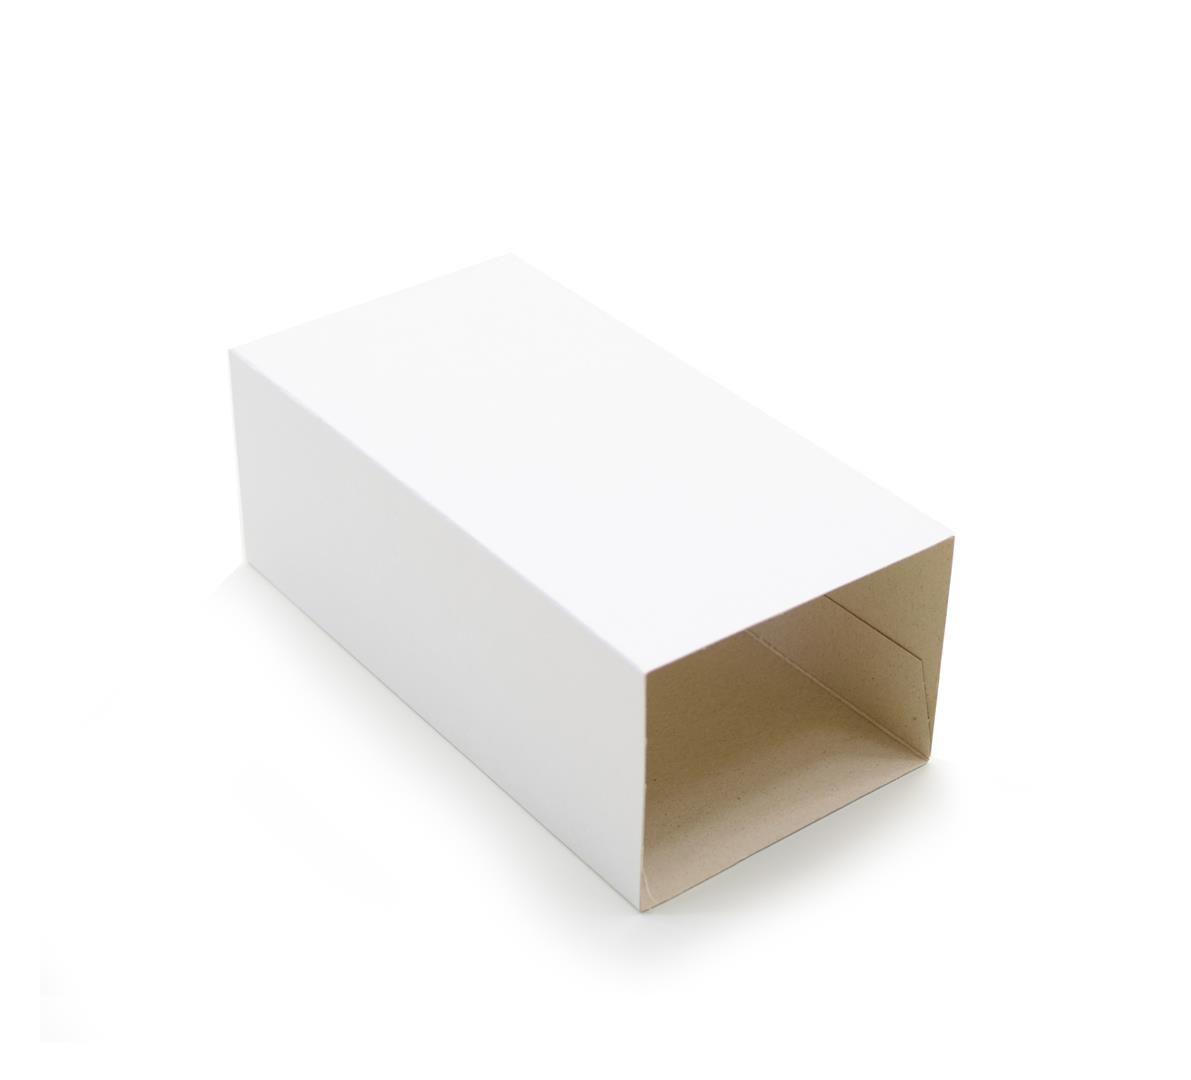 T029 - Tampa - 8,5x4,4x6,5 cm - Branca